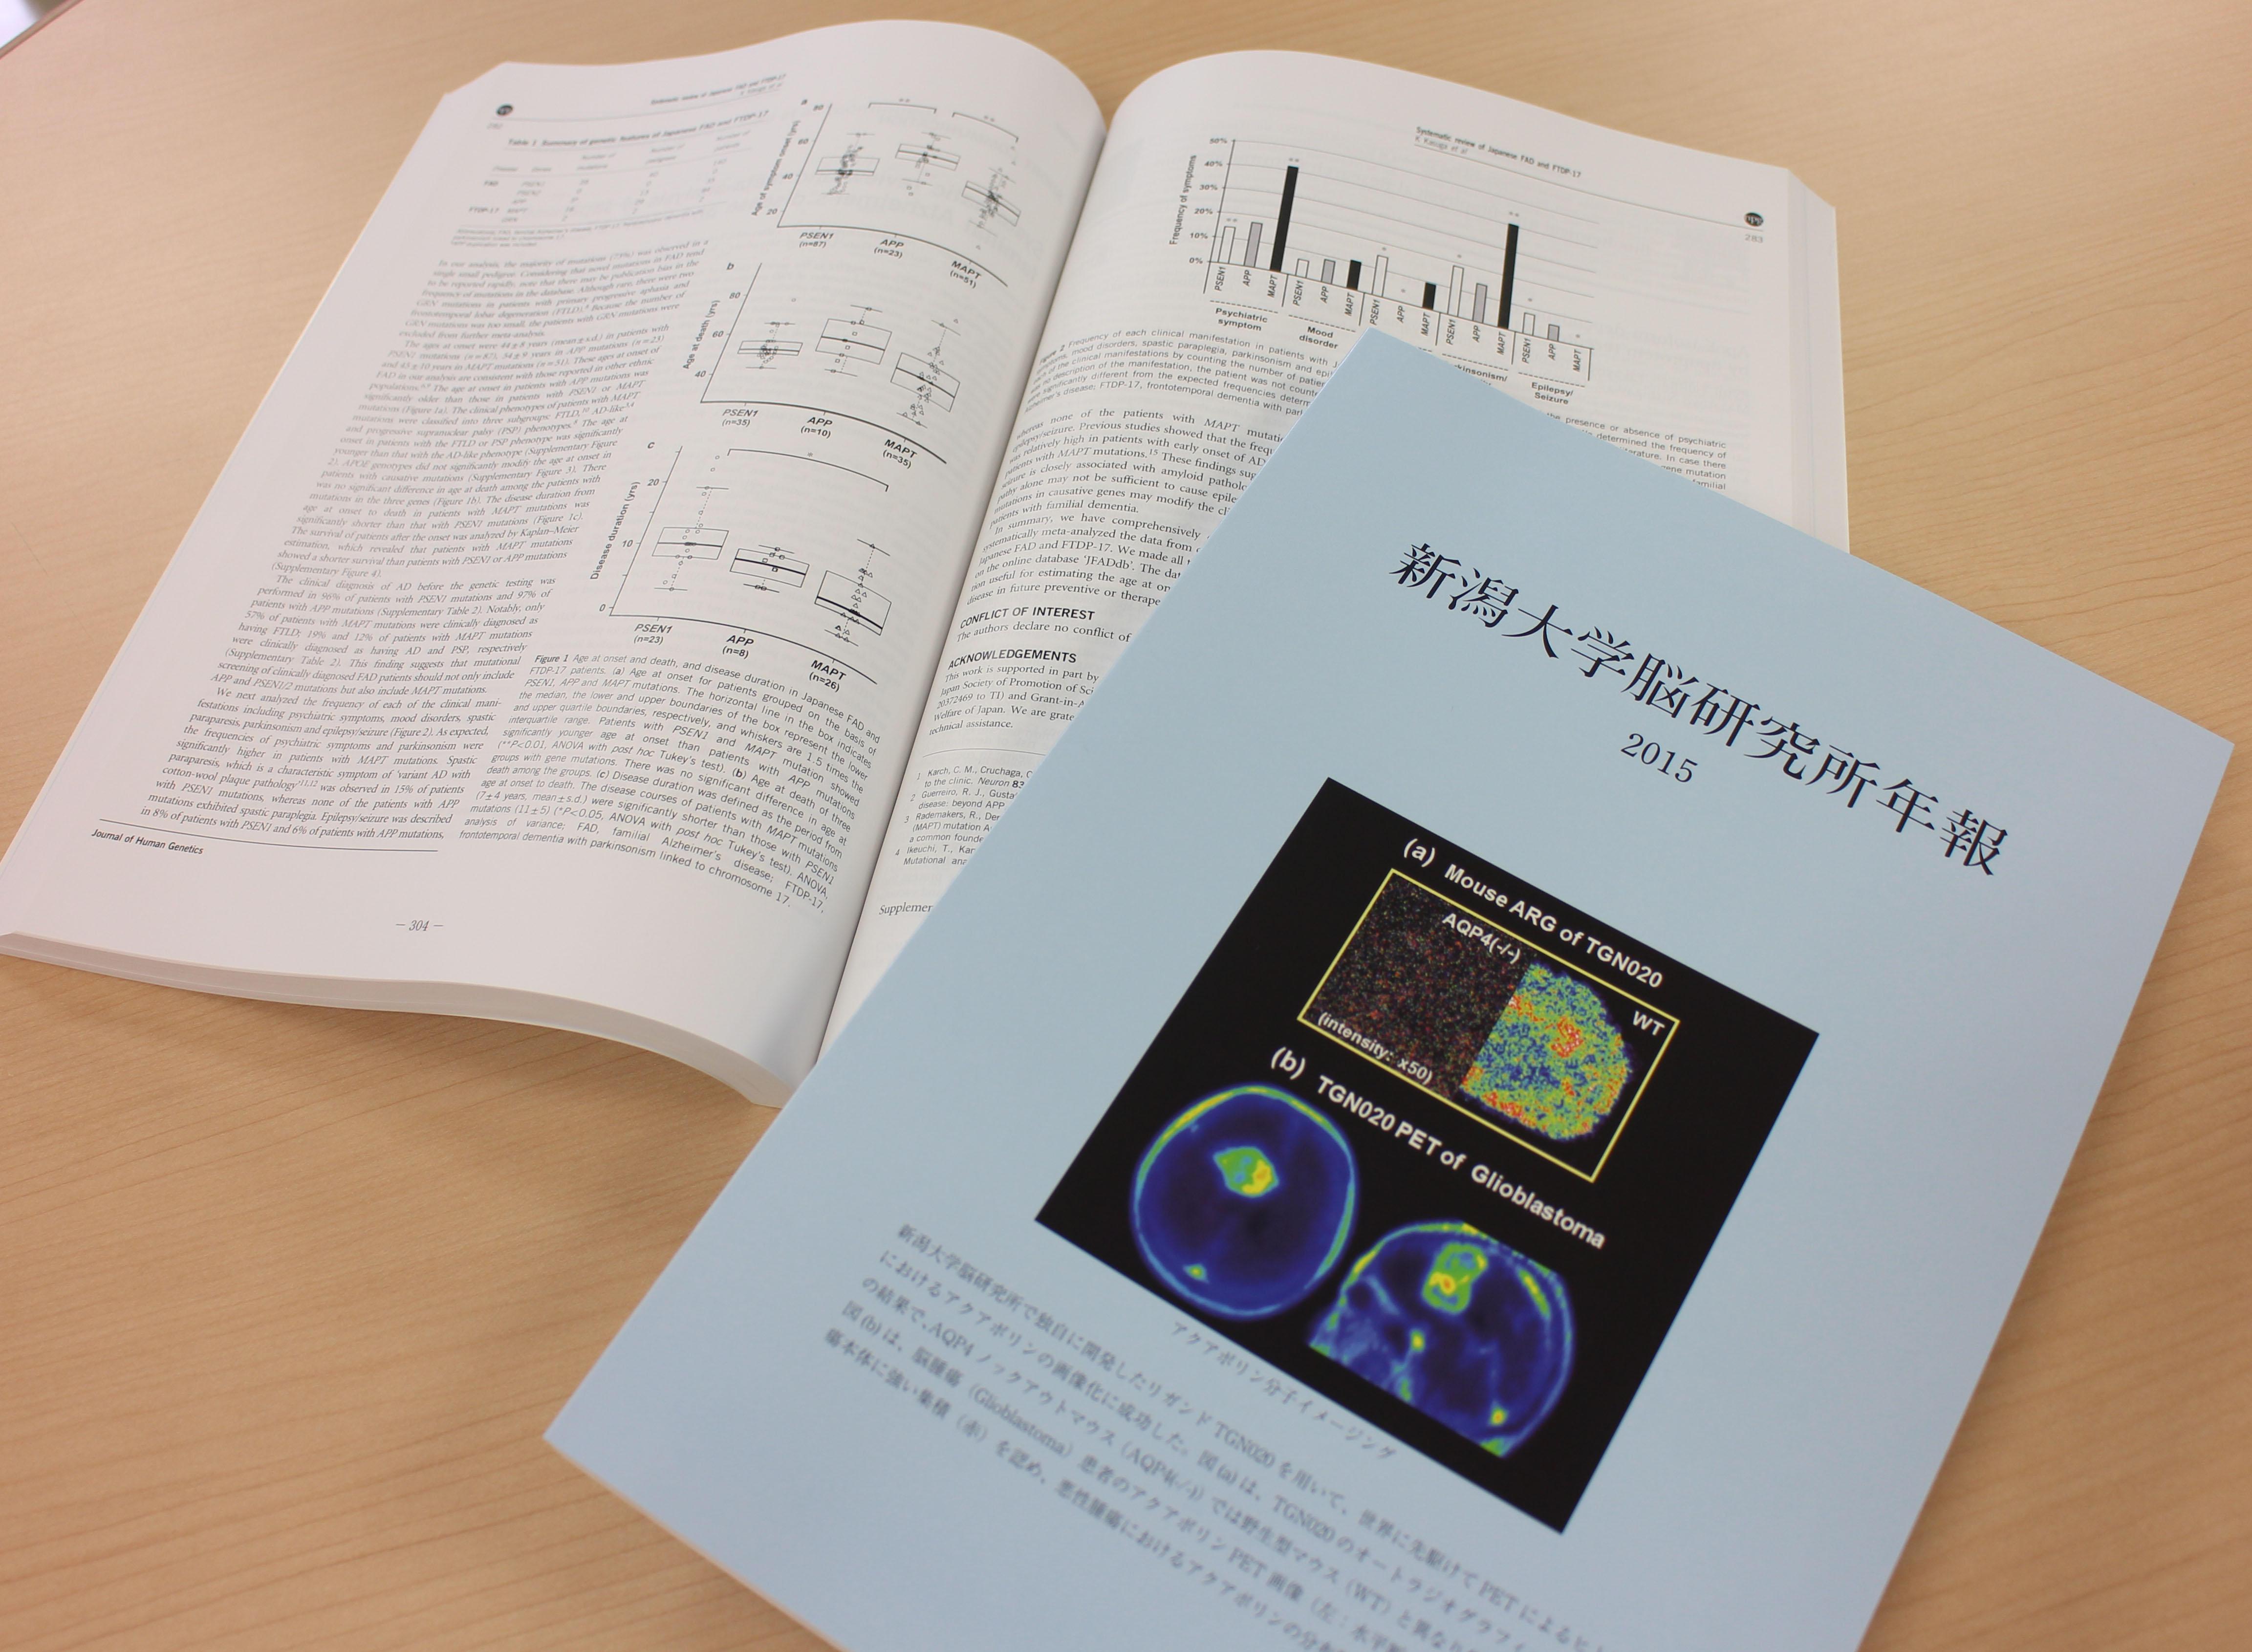 BRI Annual Report 2015 published